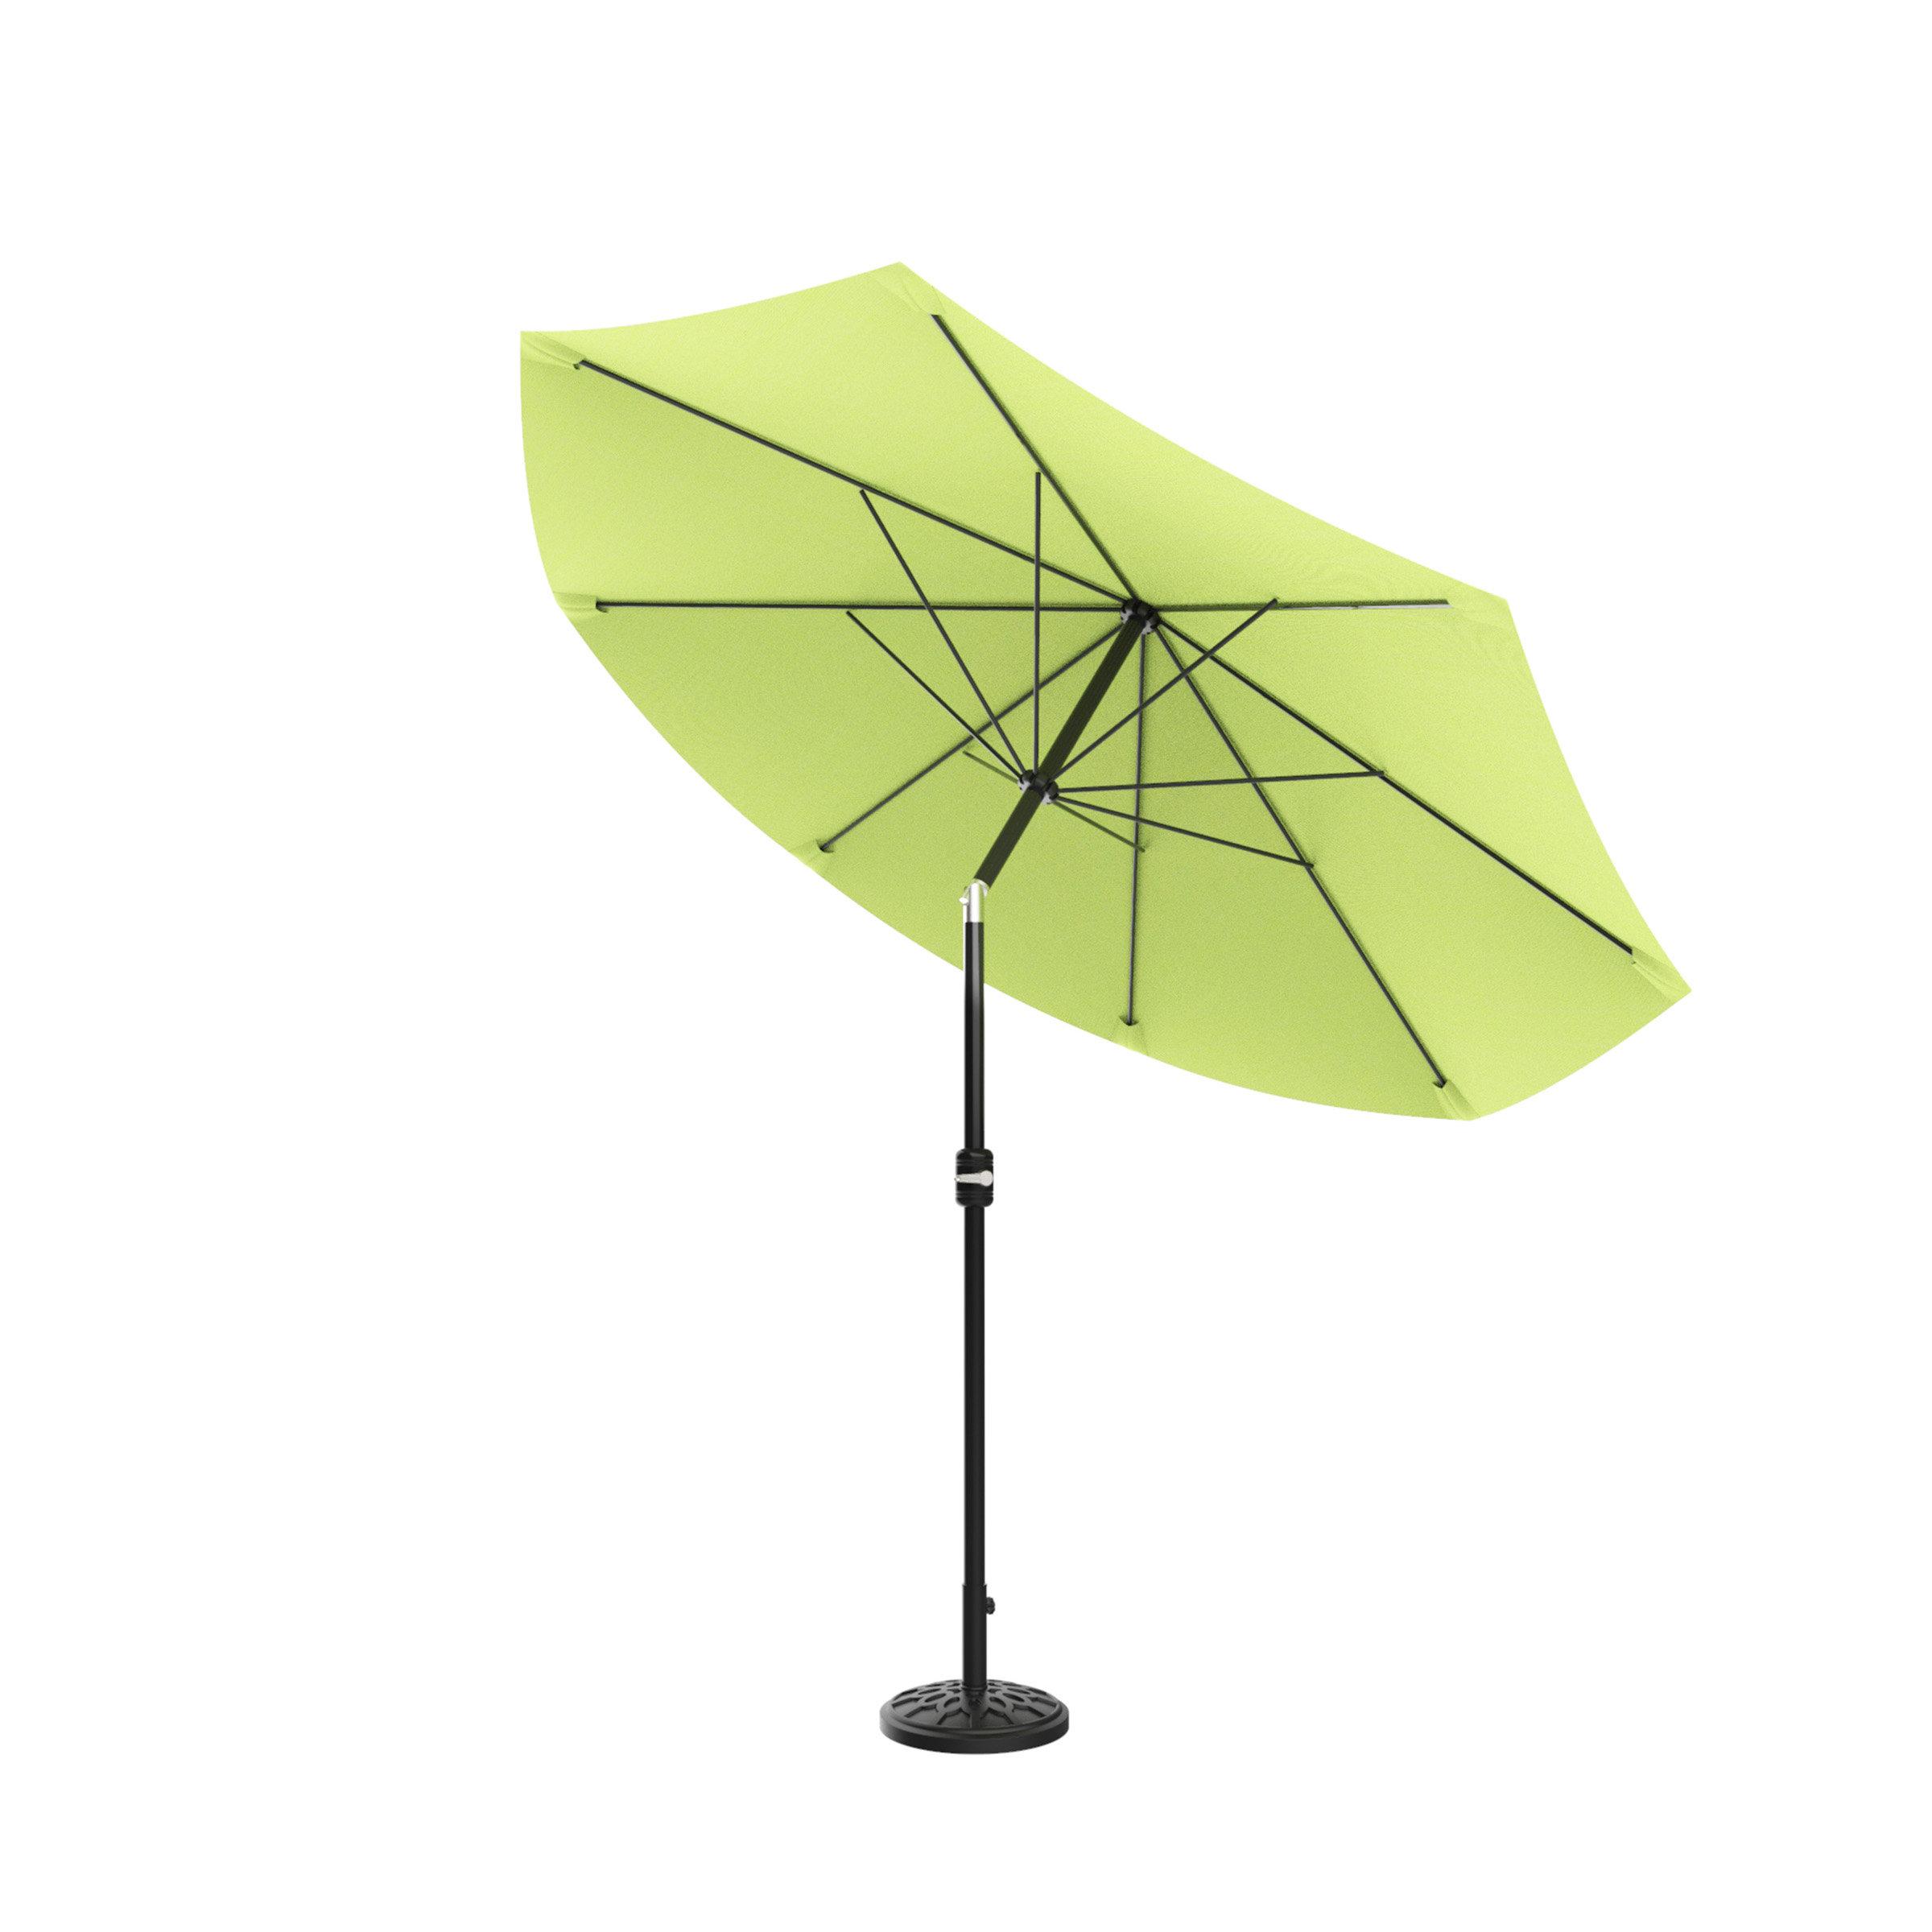 Monty Market Umbrellas In Latest Beachcrest Home Kelton 10' Market Umbrella (Gallery 7 of 20)